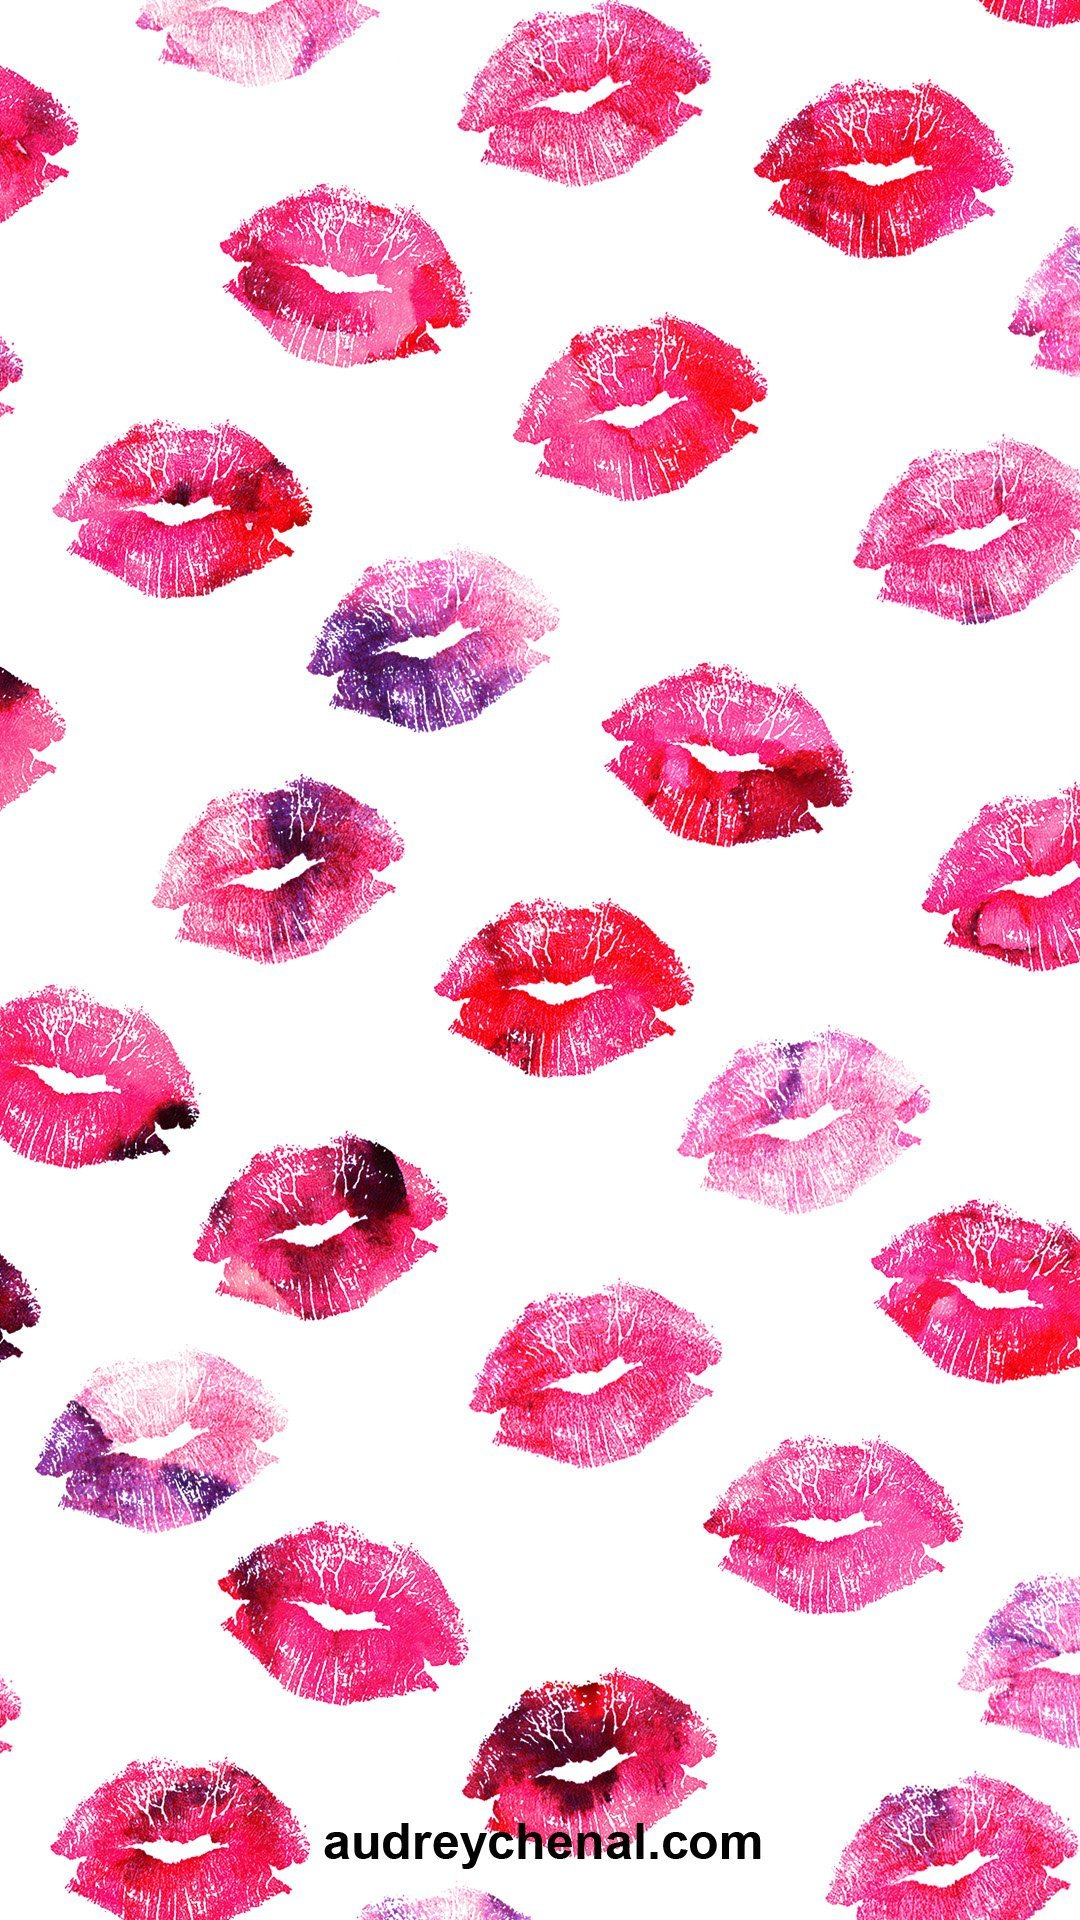 wallpaper Pink purple watercolor kiss lips pattern by Audrey Chenal